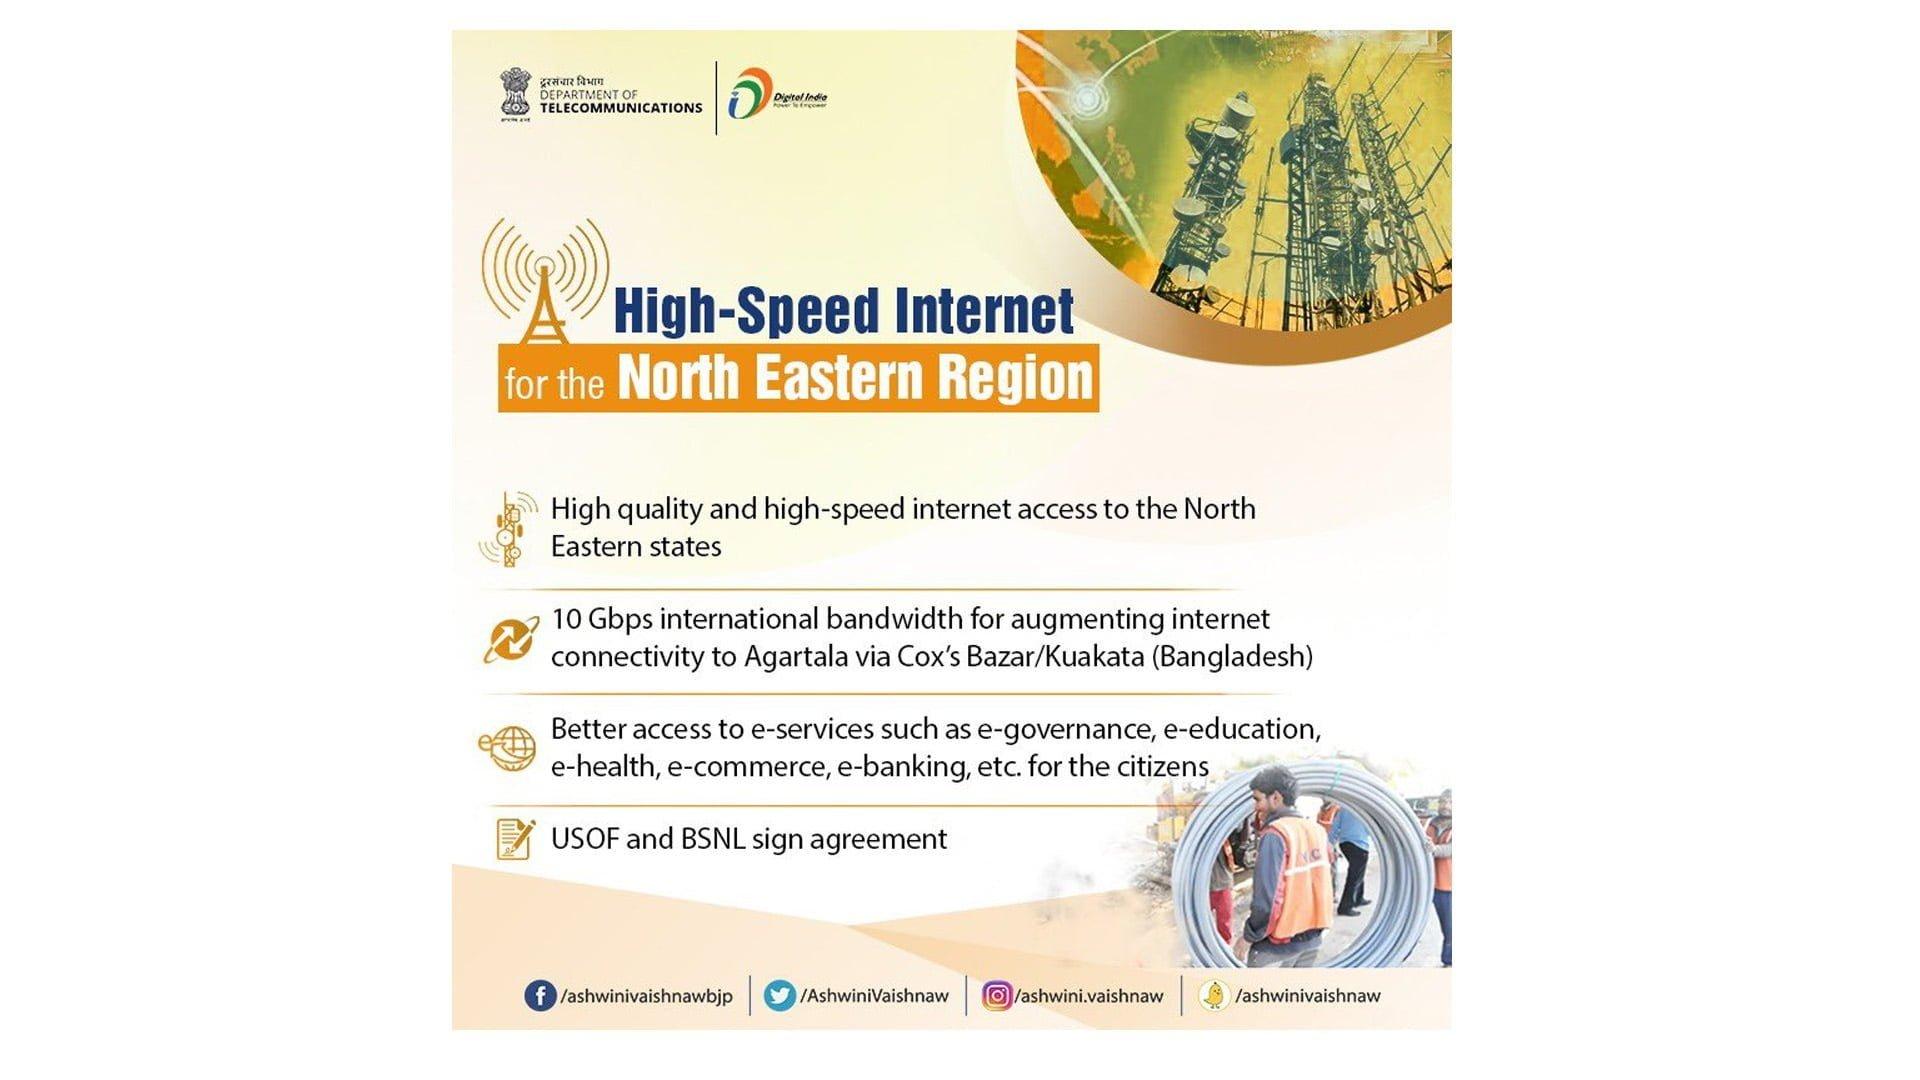 North East International Bandwidth USOF